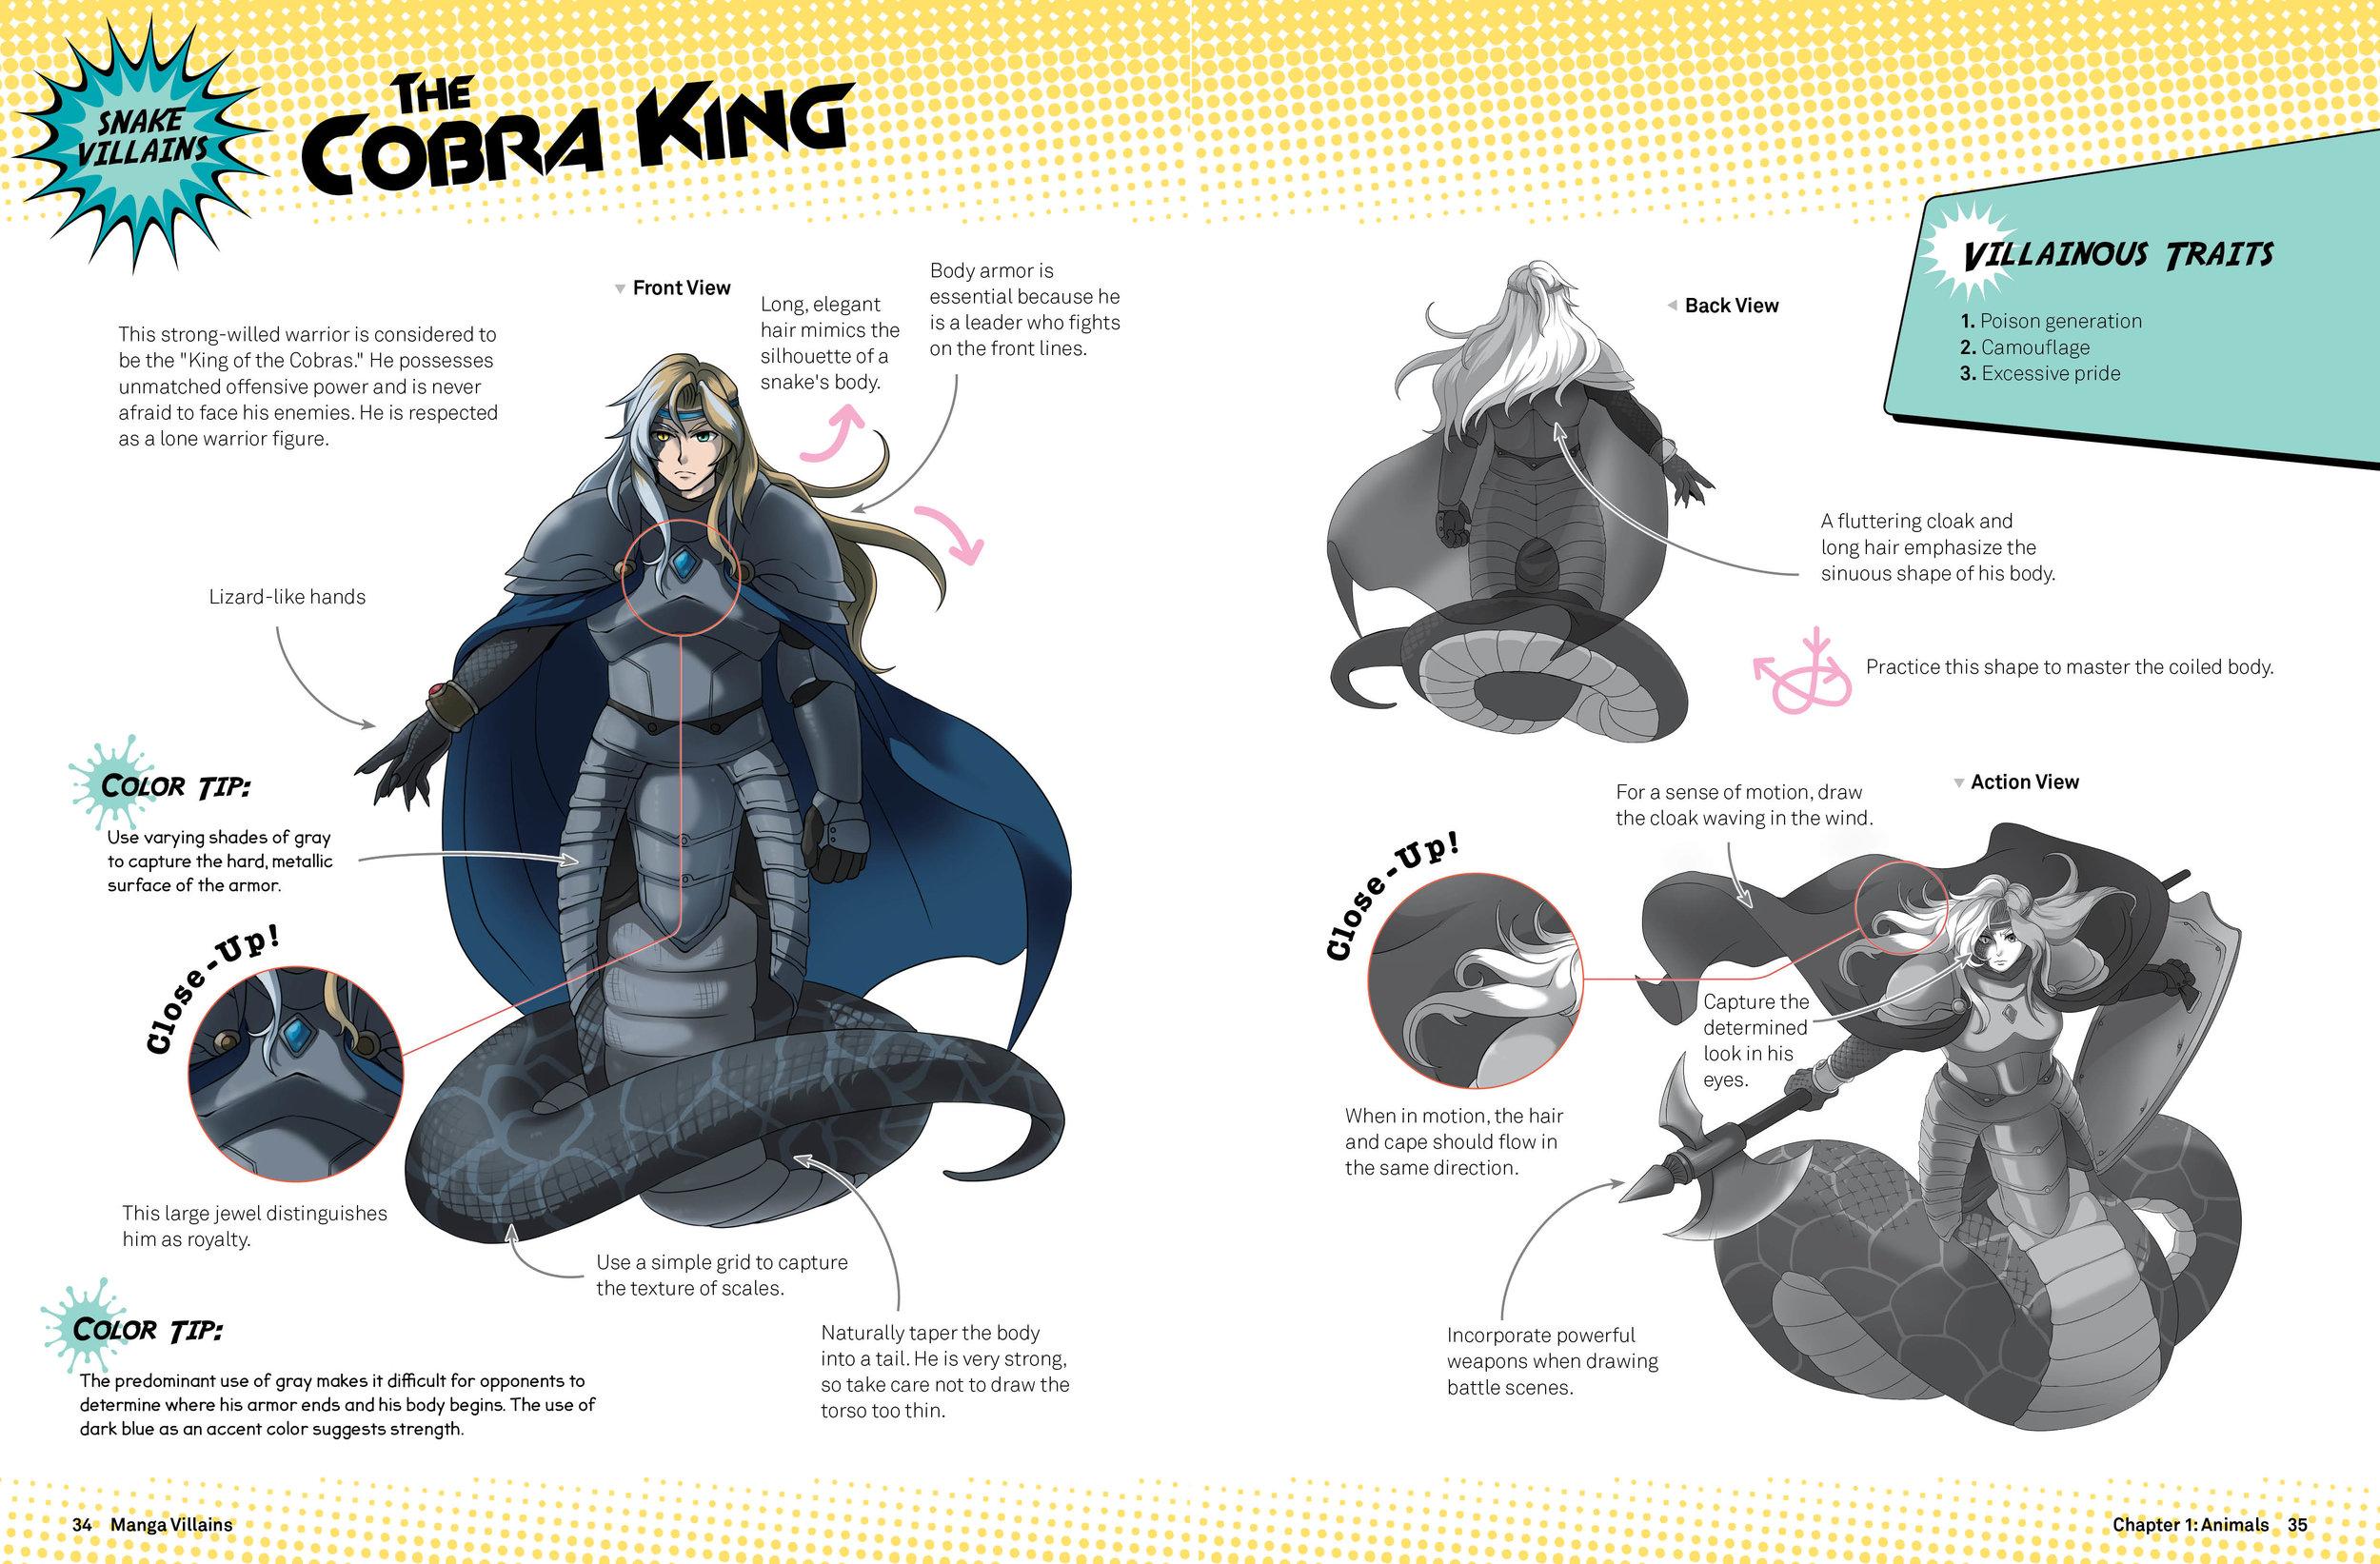 Draw Manga Villains 34.35.jpg